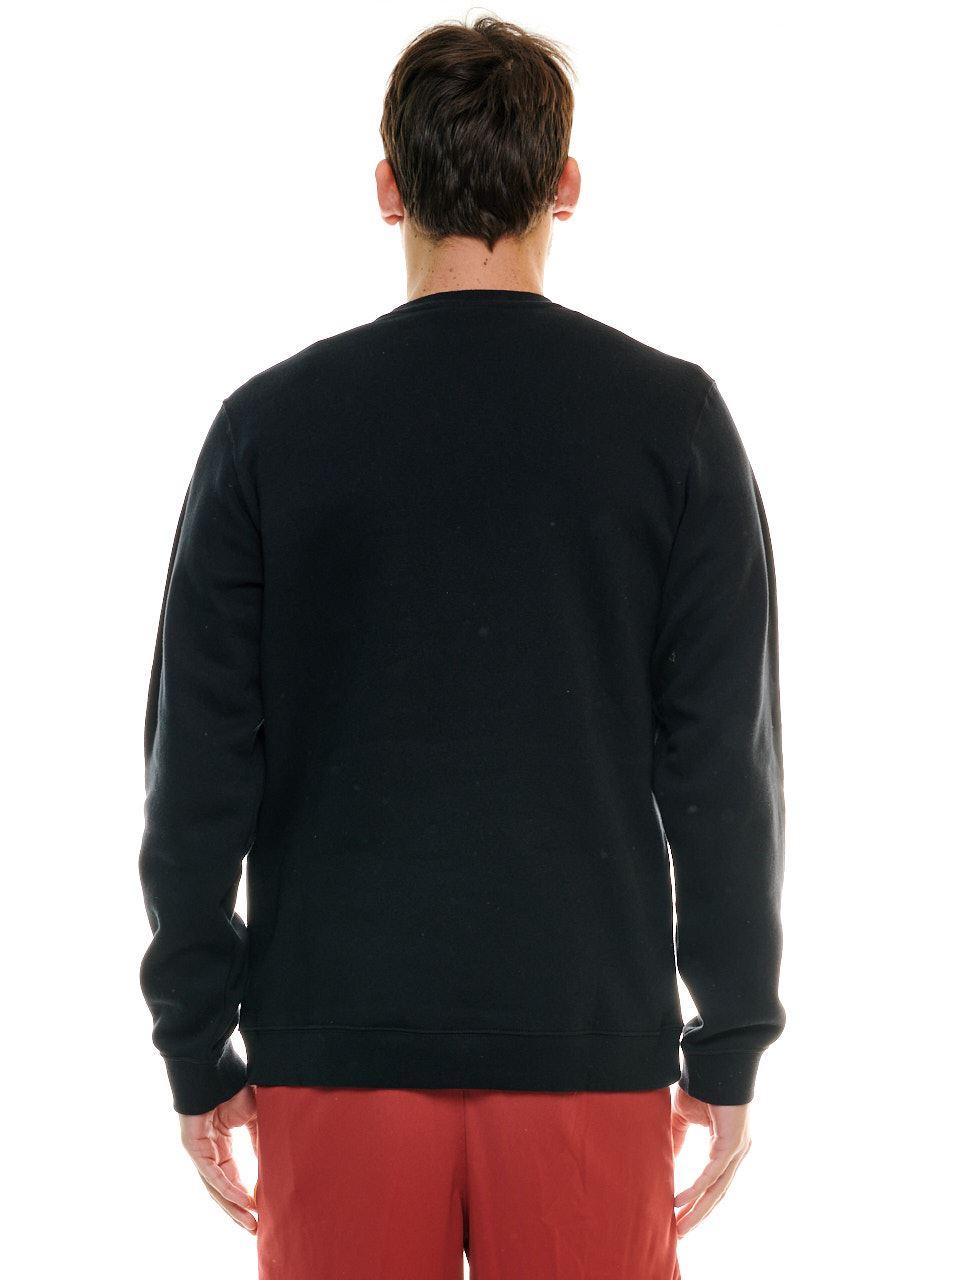 Nike Galatasaray Sweatshirt (Siyah) Aj1466-010